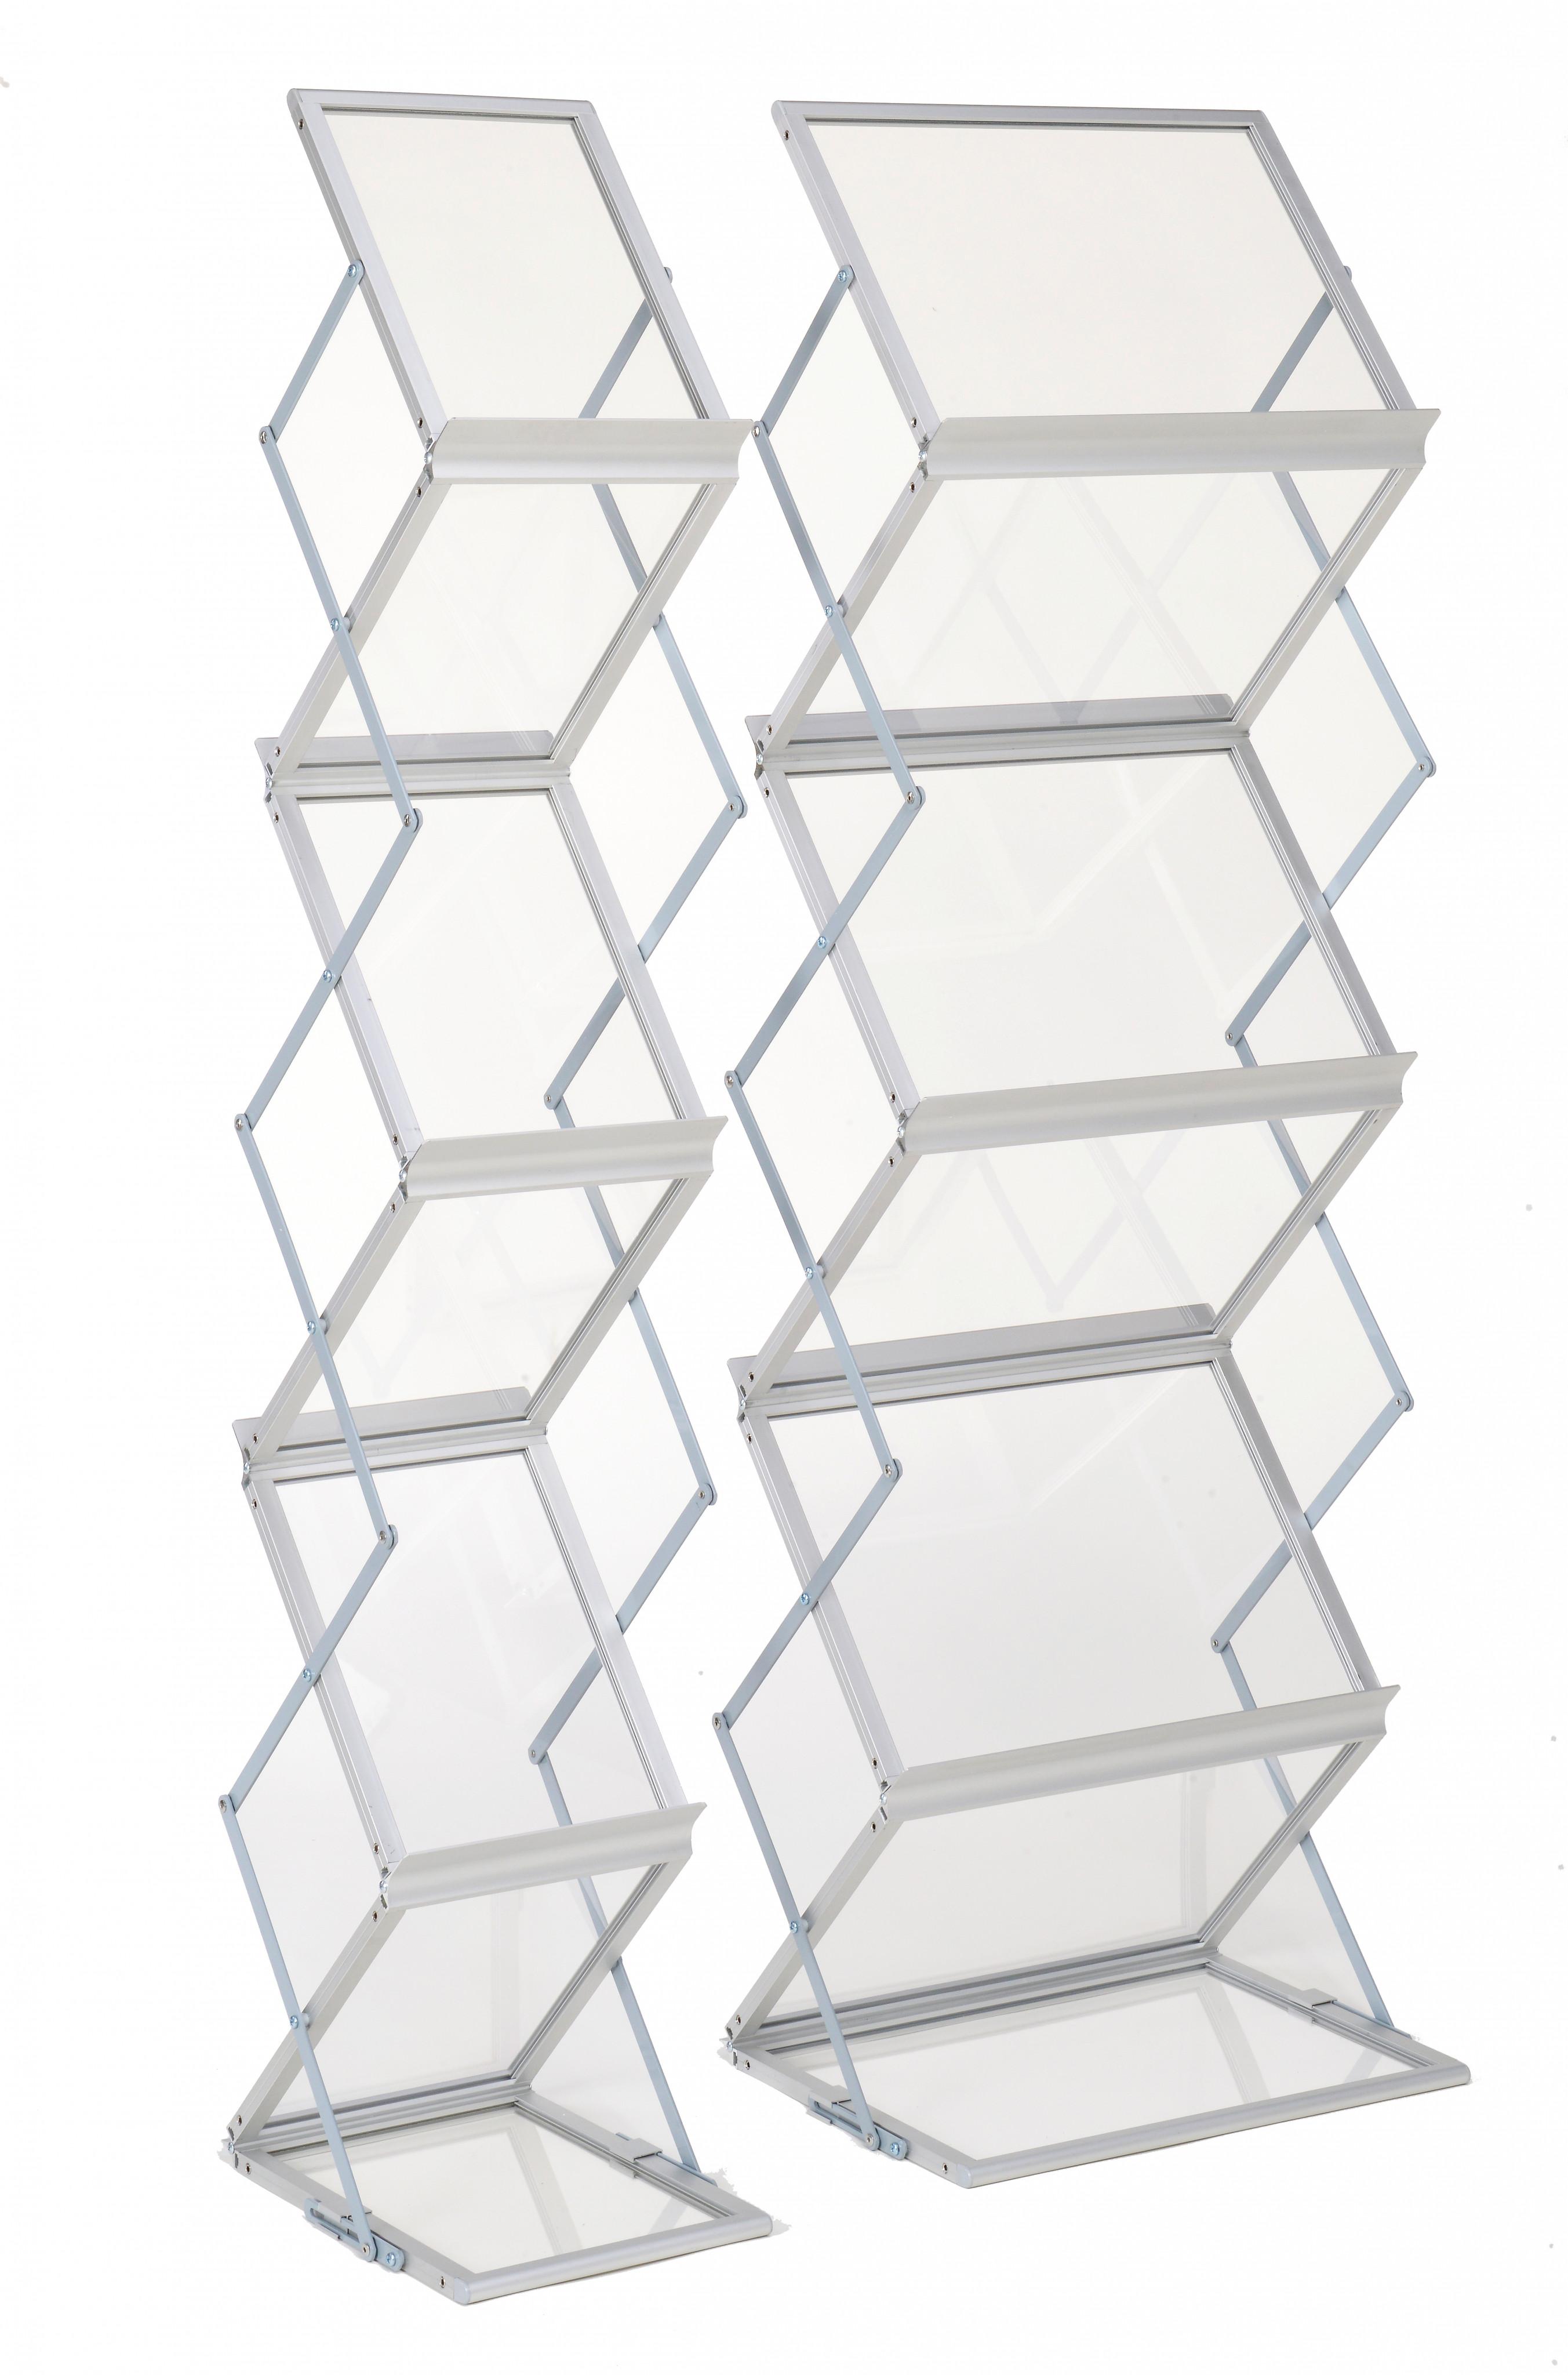 Falt-Prospektständer, Acryl, schwarz eloxiert, 6 x DIN A3